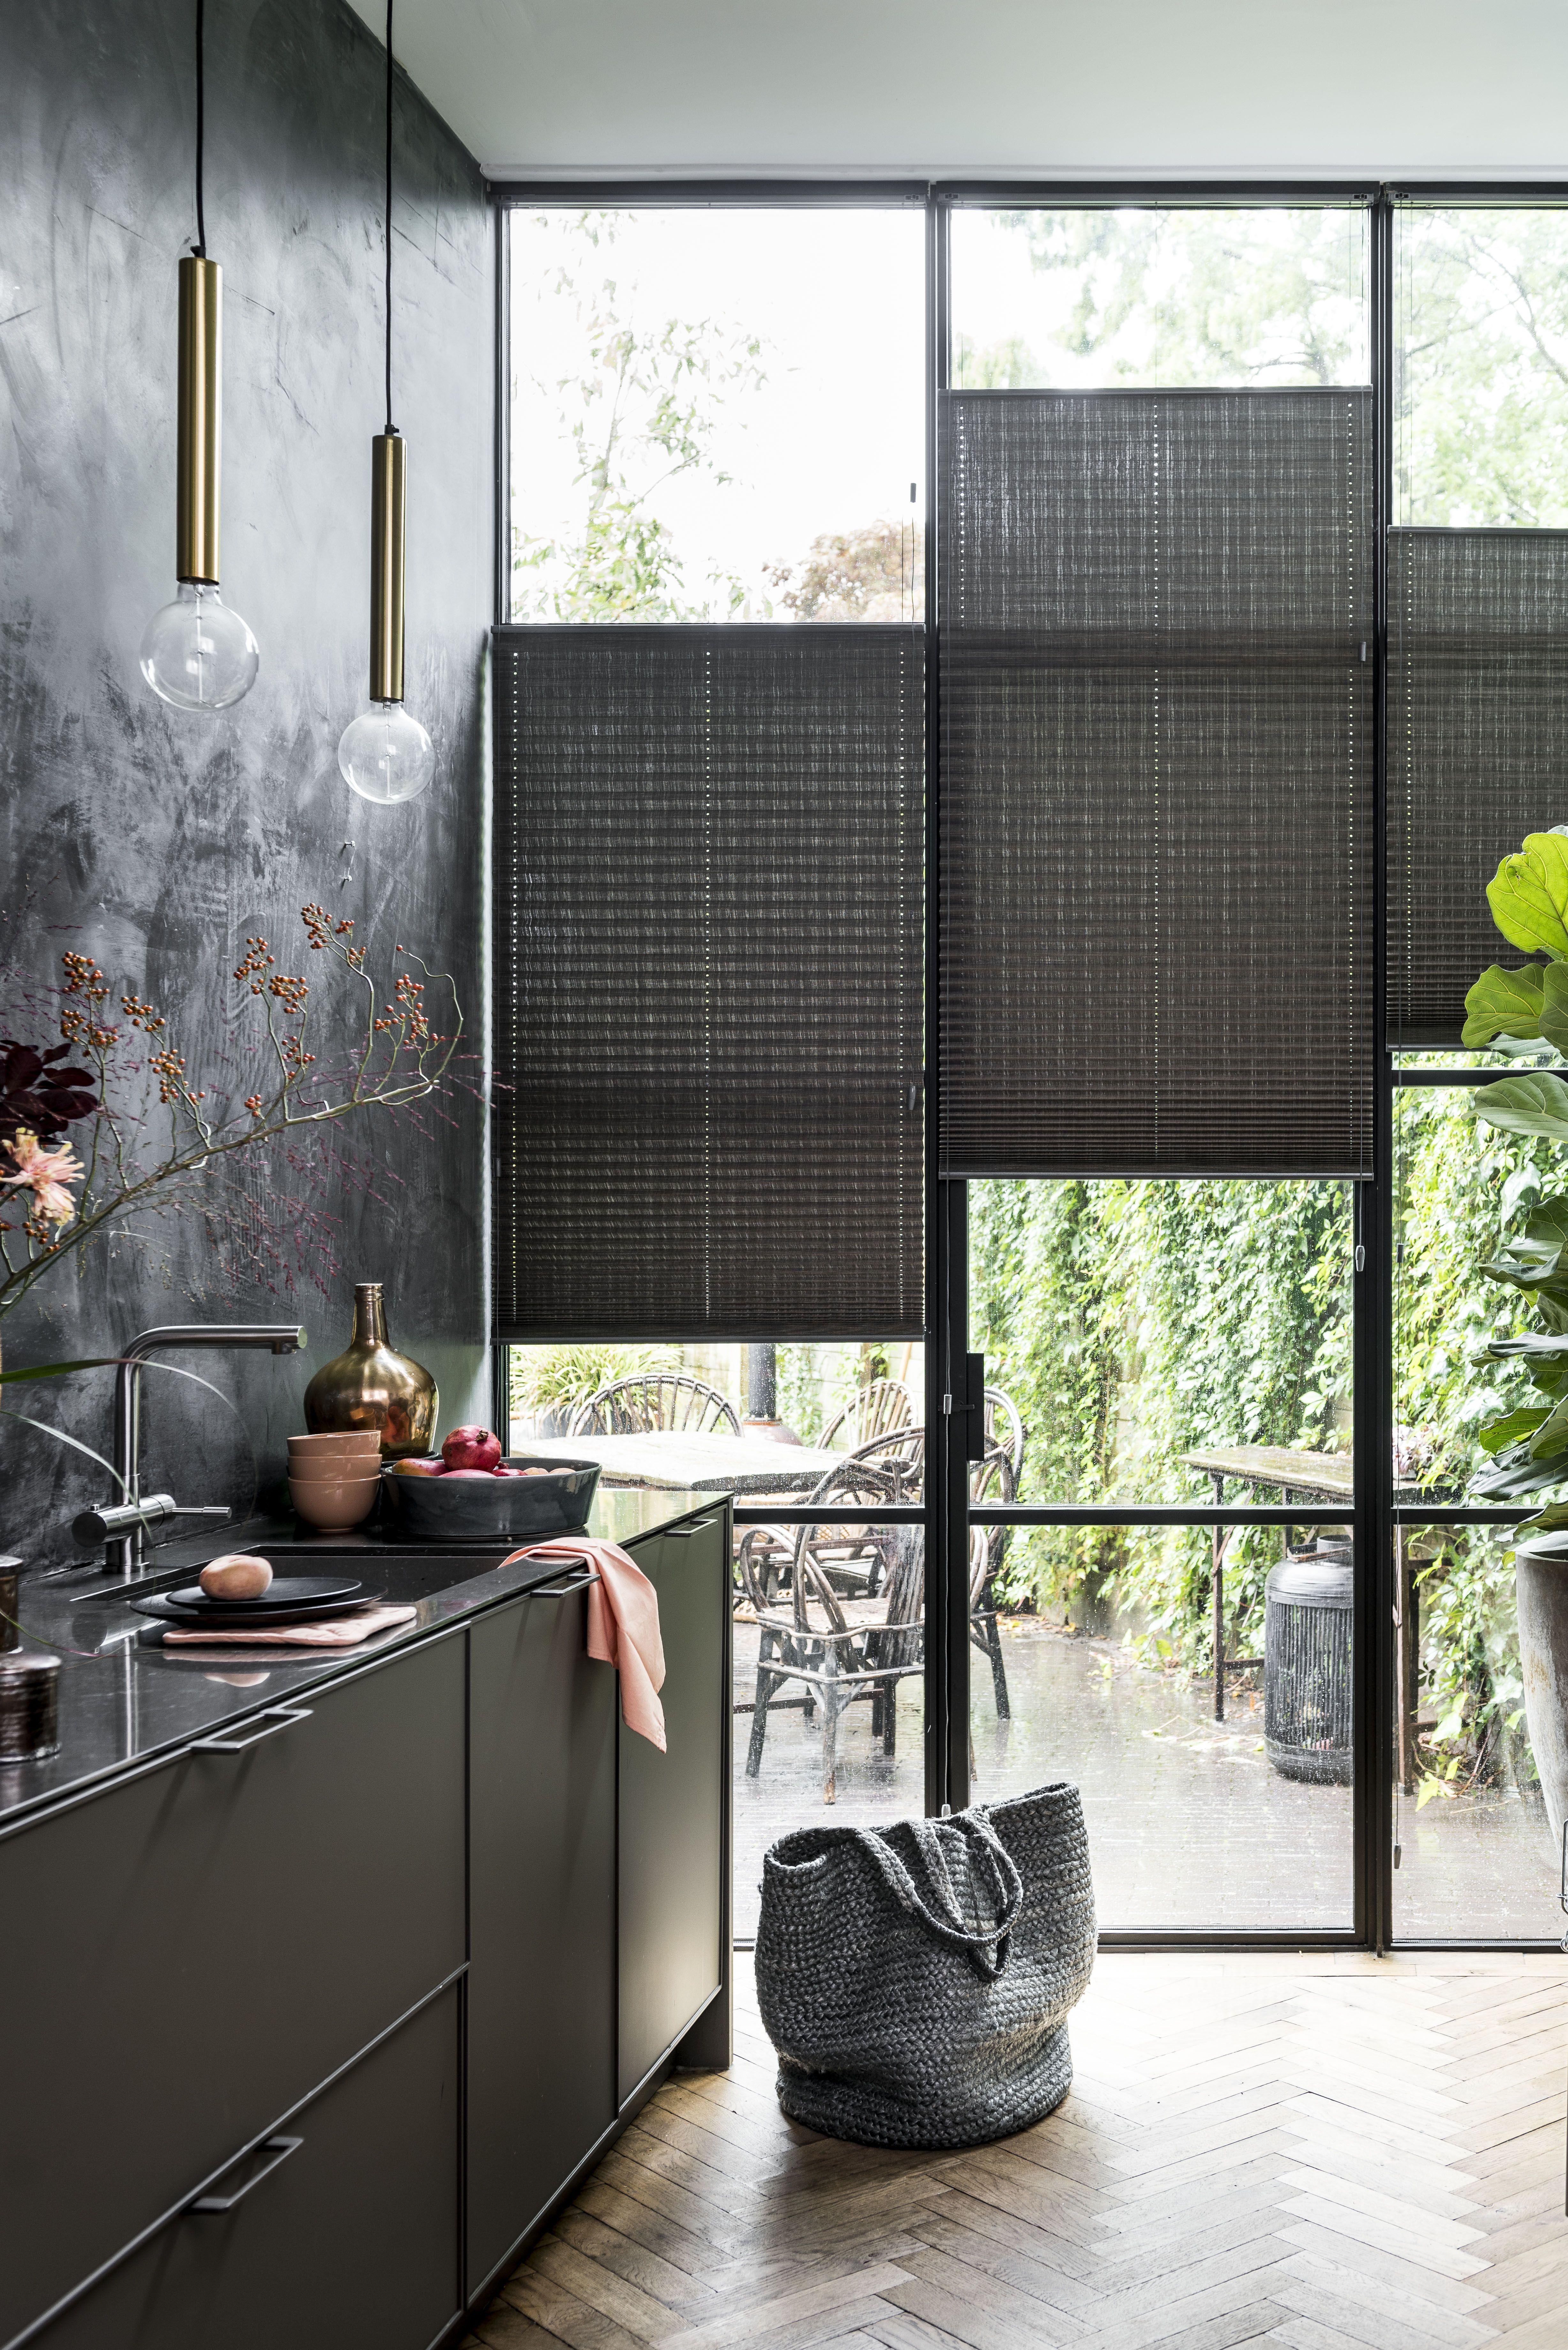 Mooi én strak! #raamdecoratie #inspiratie #bece #woonkamer #rust #plissé